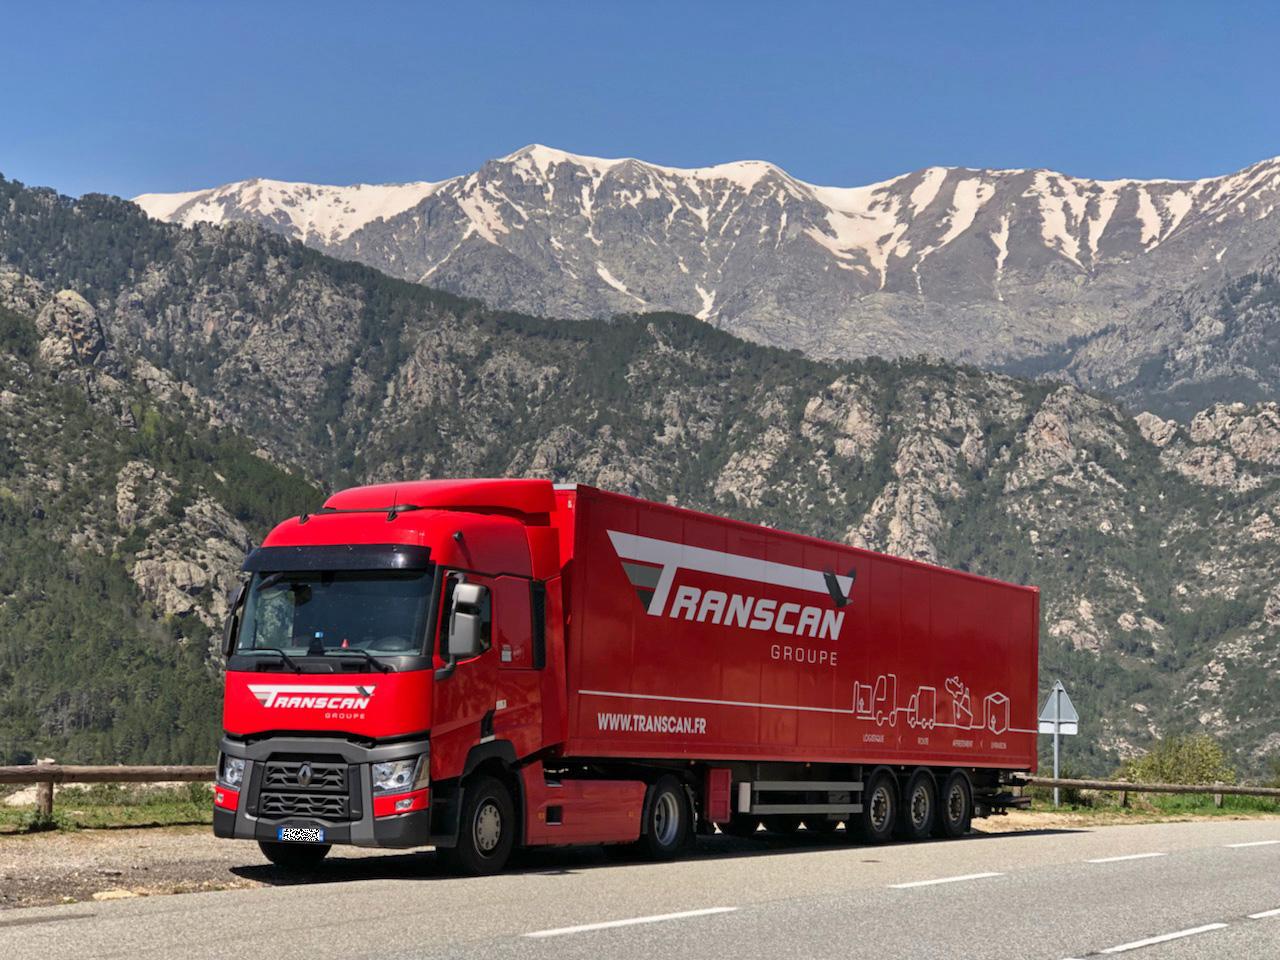 Transport de marchandises Transcan